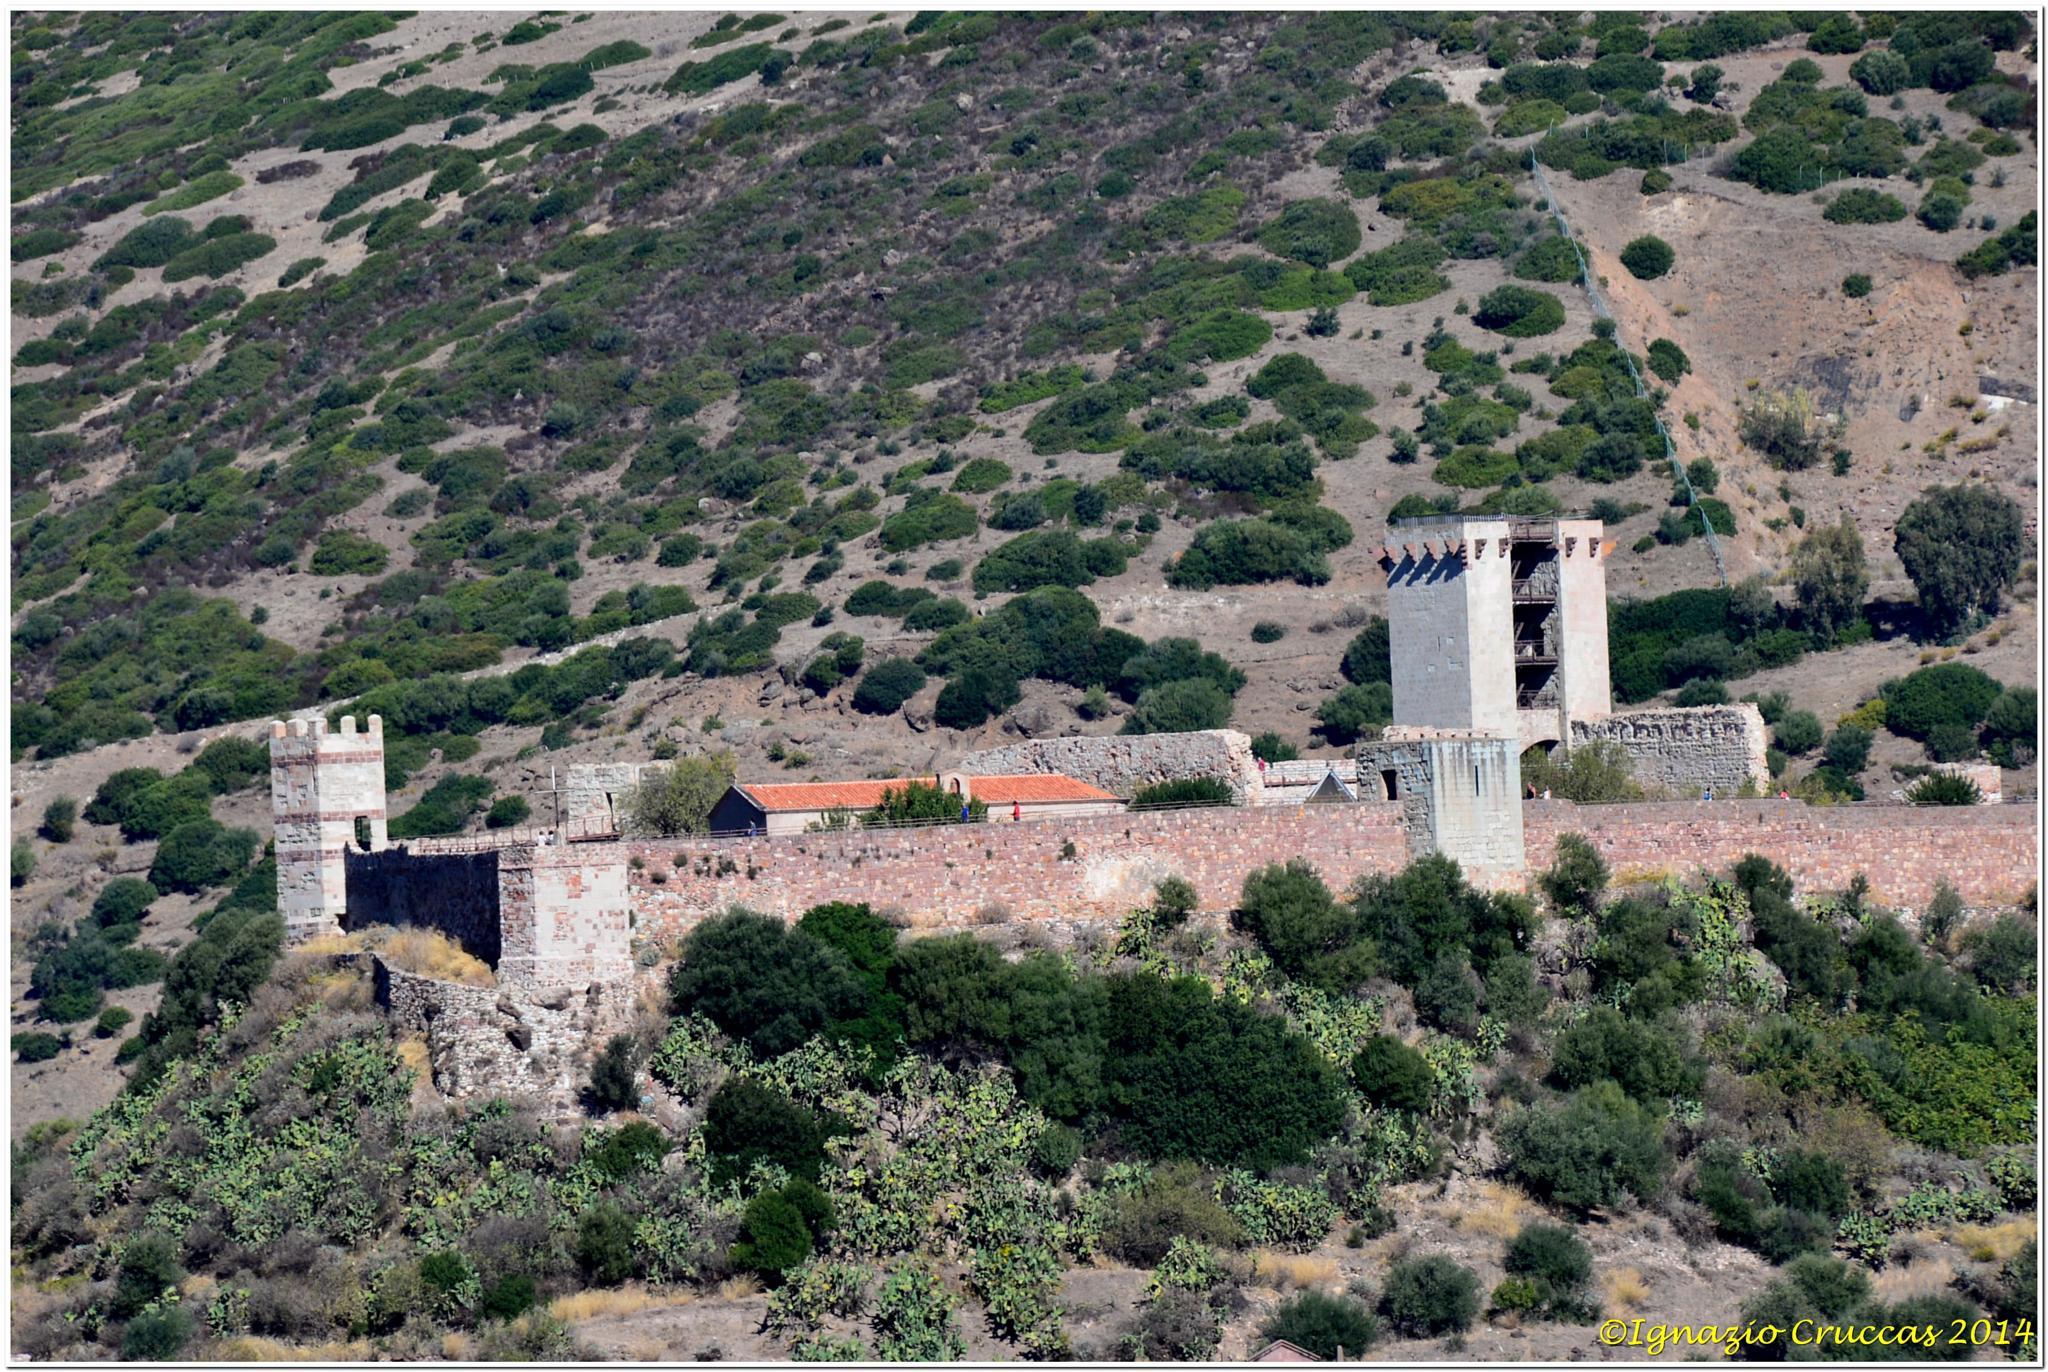 The Castle .... by ignazio cruccas